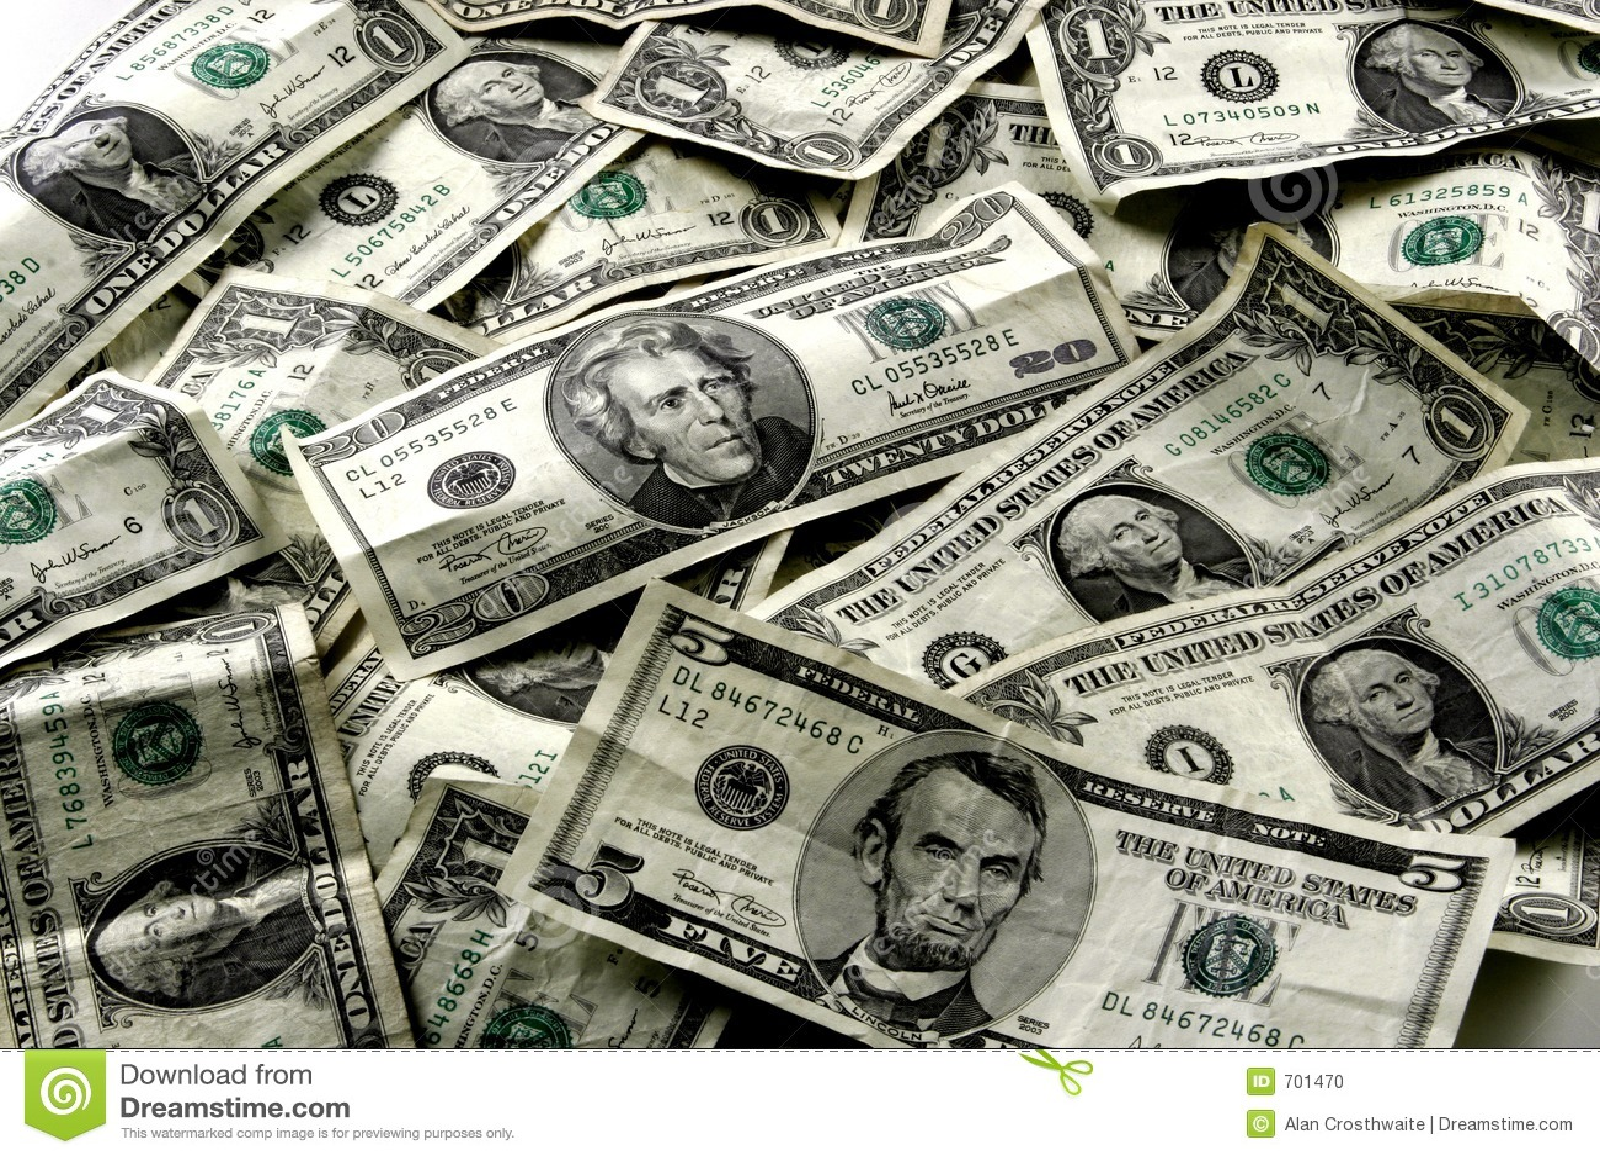 Us Currency Stock Photo Image Of Debtors Currencies